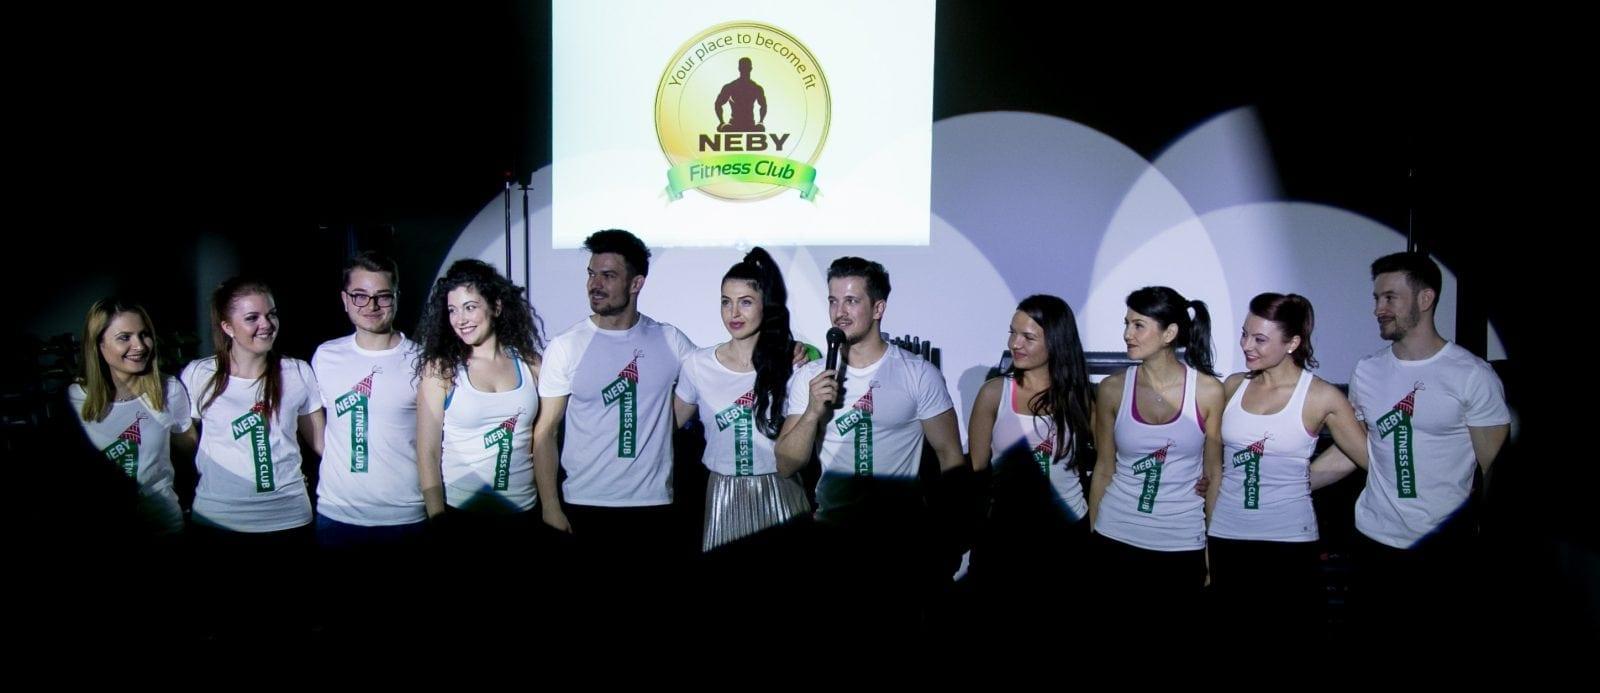 IMG 9670 e1464768128362 - Neby Fitness Club a sărbătorit un an